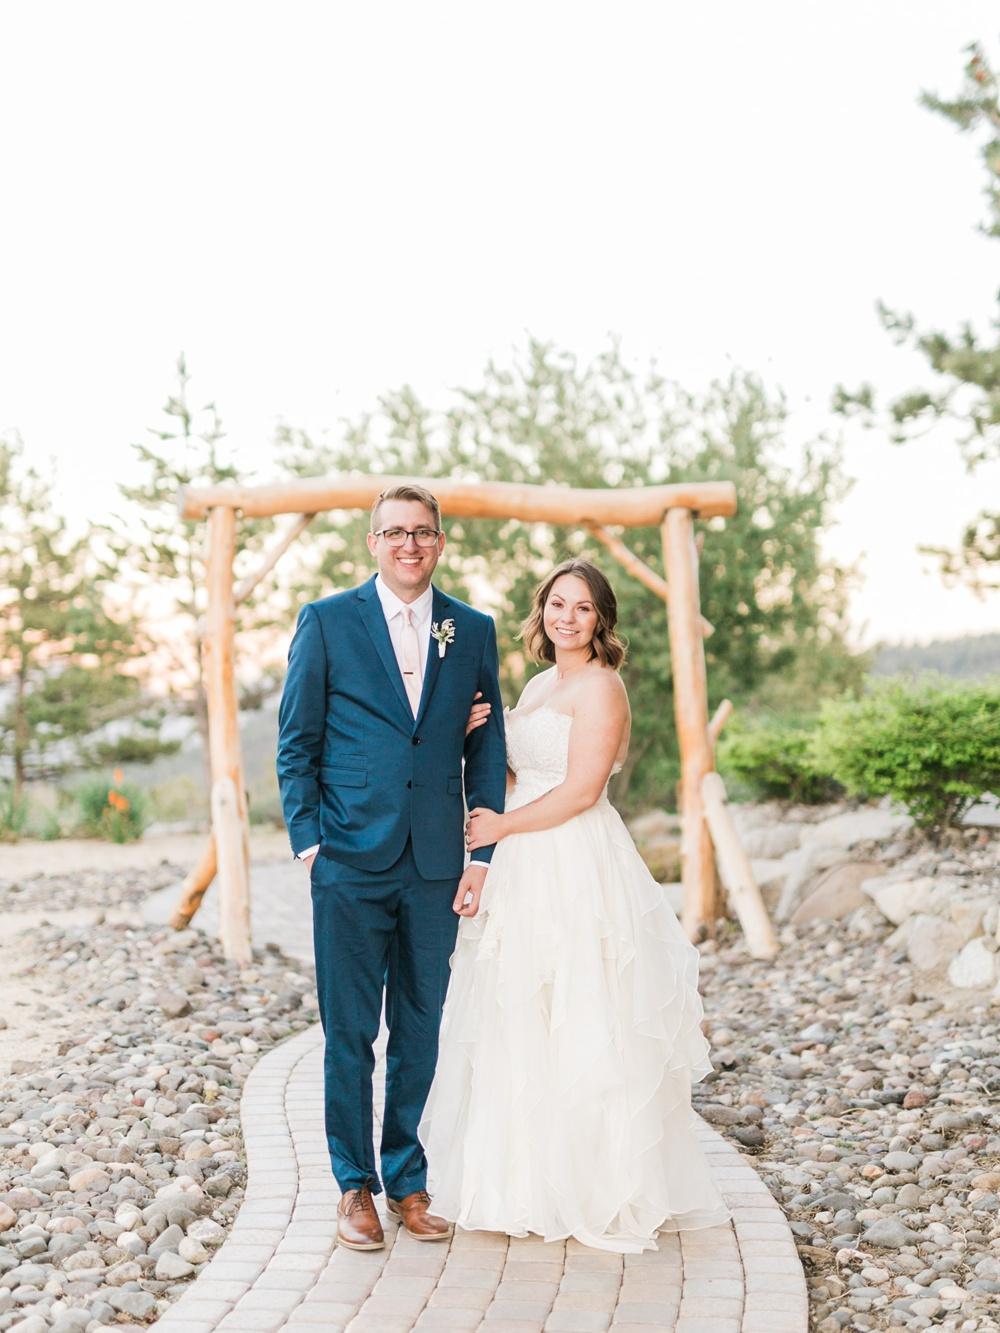 Tannenbaum-Wedding-Lake-Tahoe-Wedding-Photographer-117.jpg